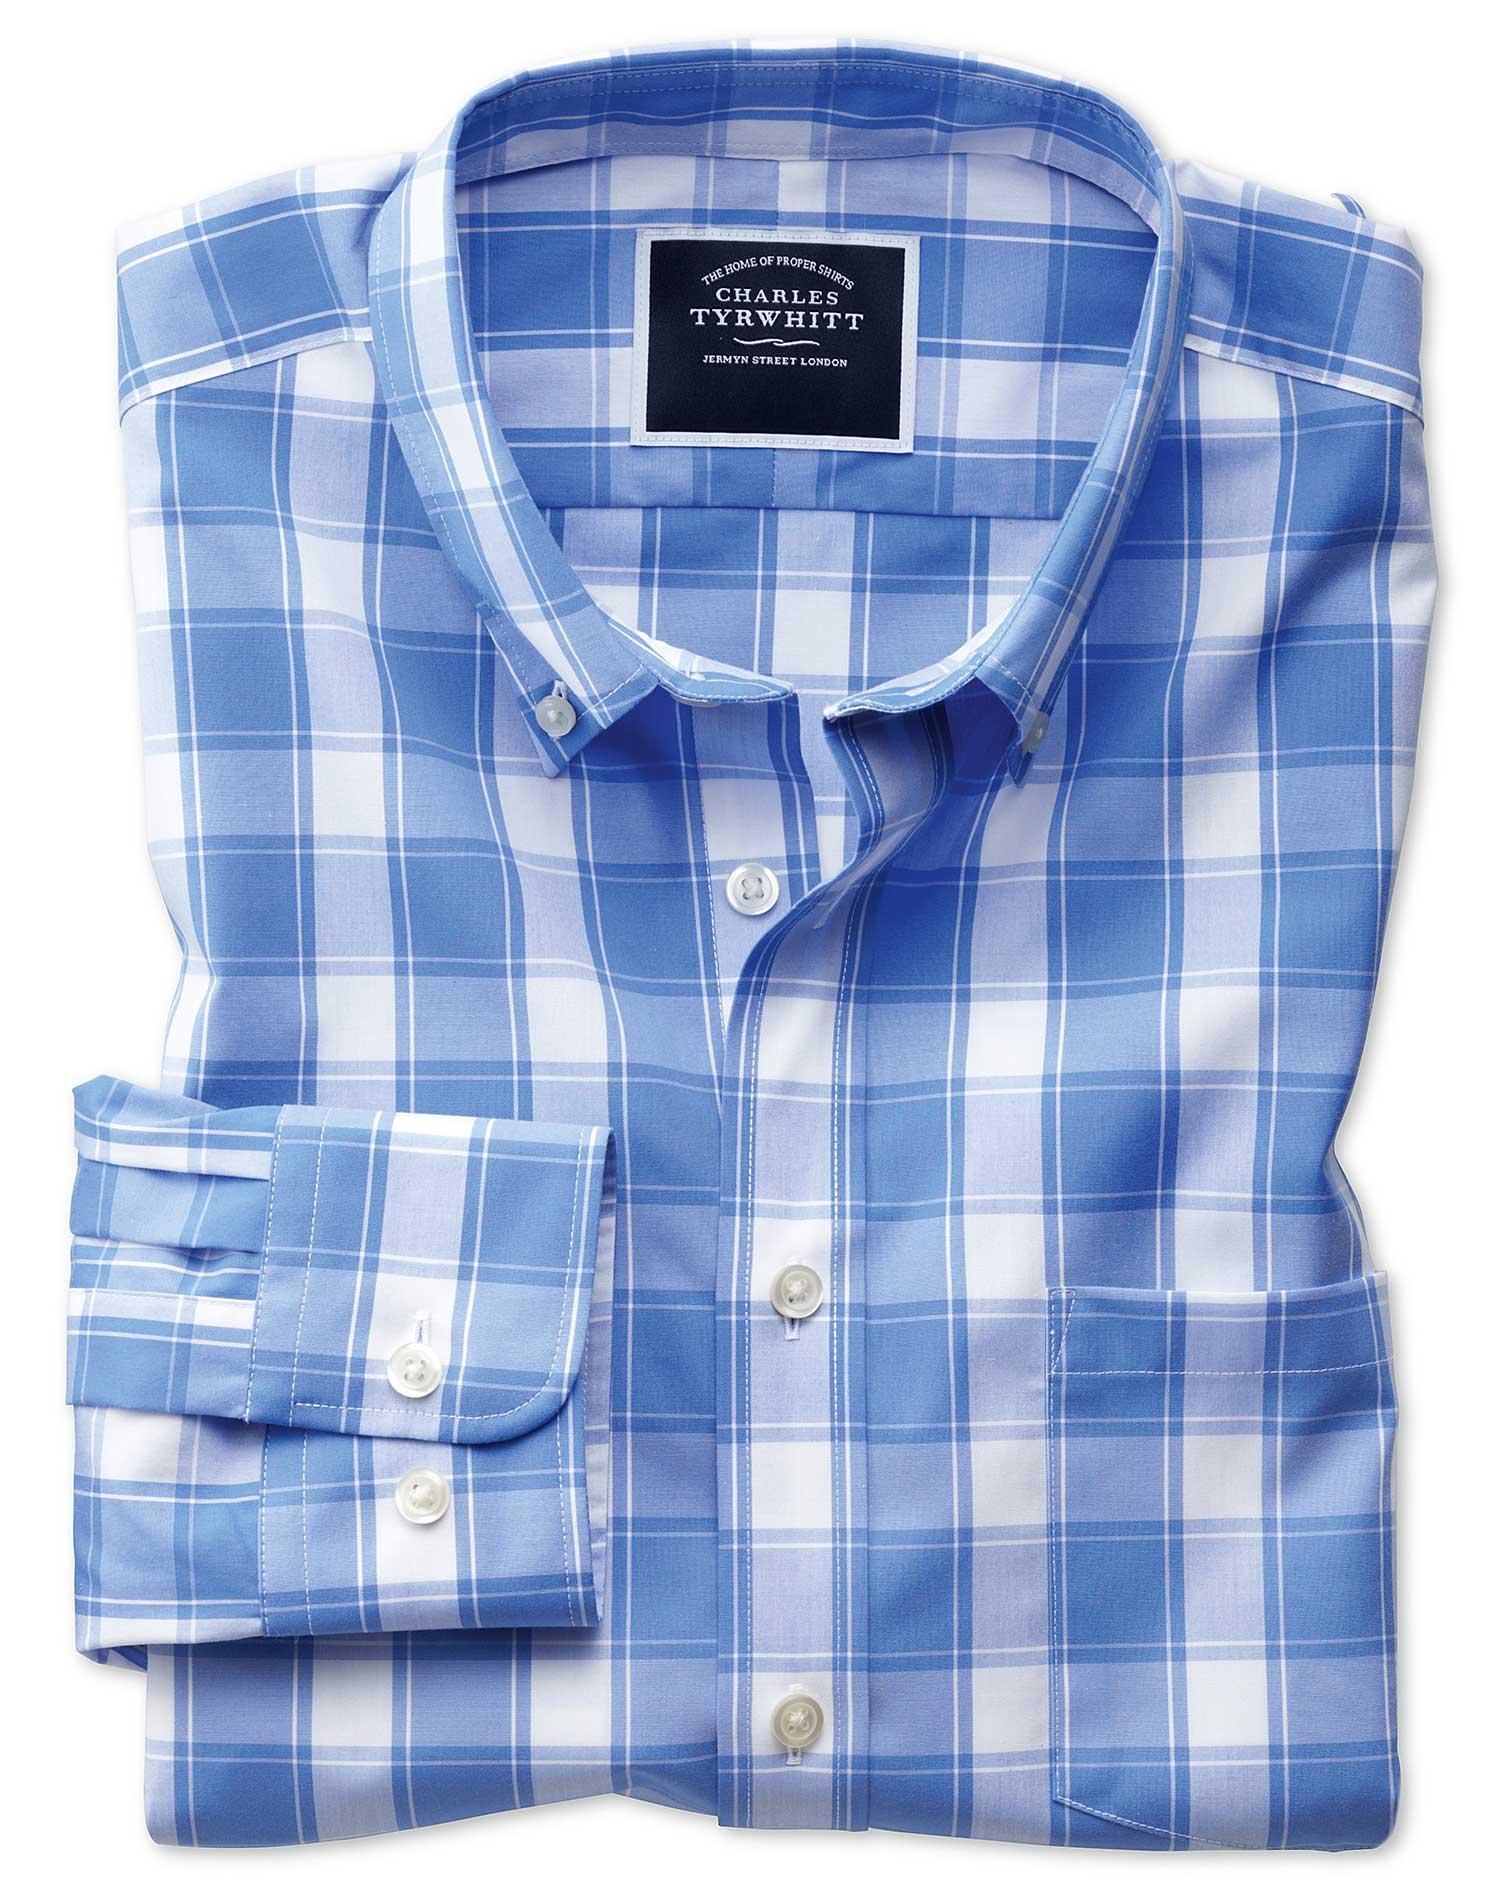 Slim Fit Button-Down Non-Iron Poplin Blue and White Check Cotton Shirt Single Cuff Size Small by Cha